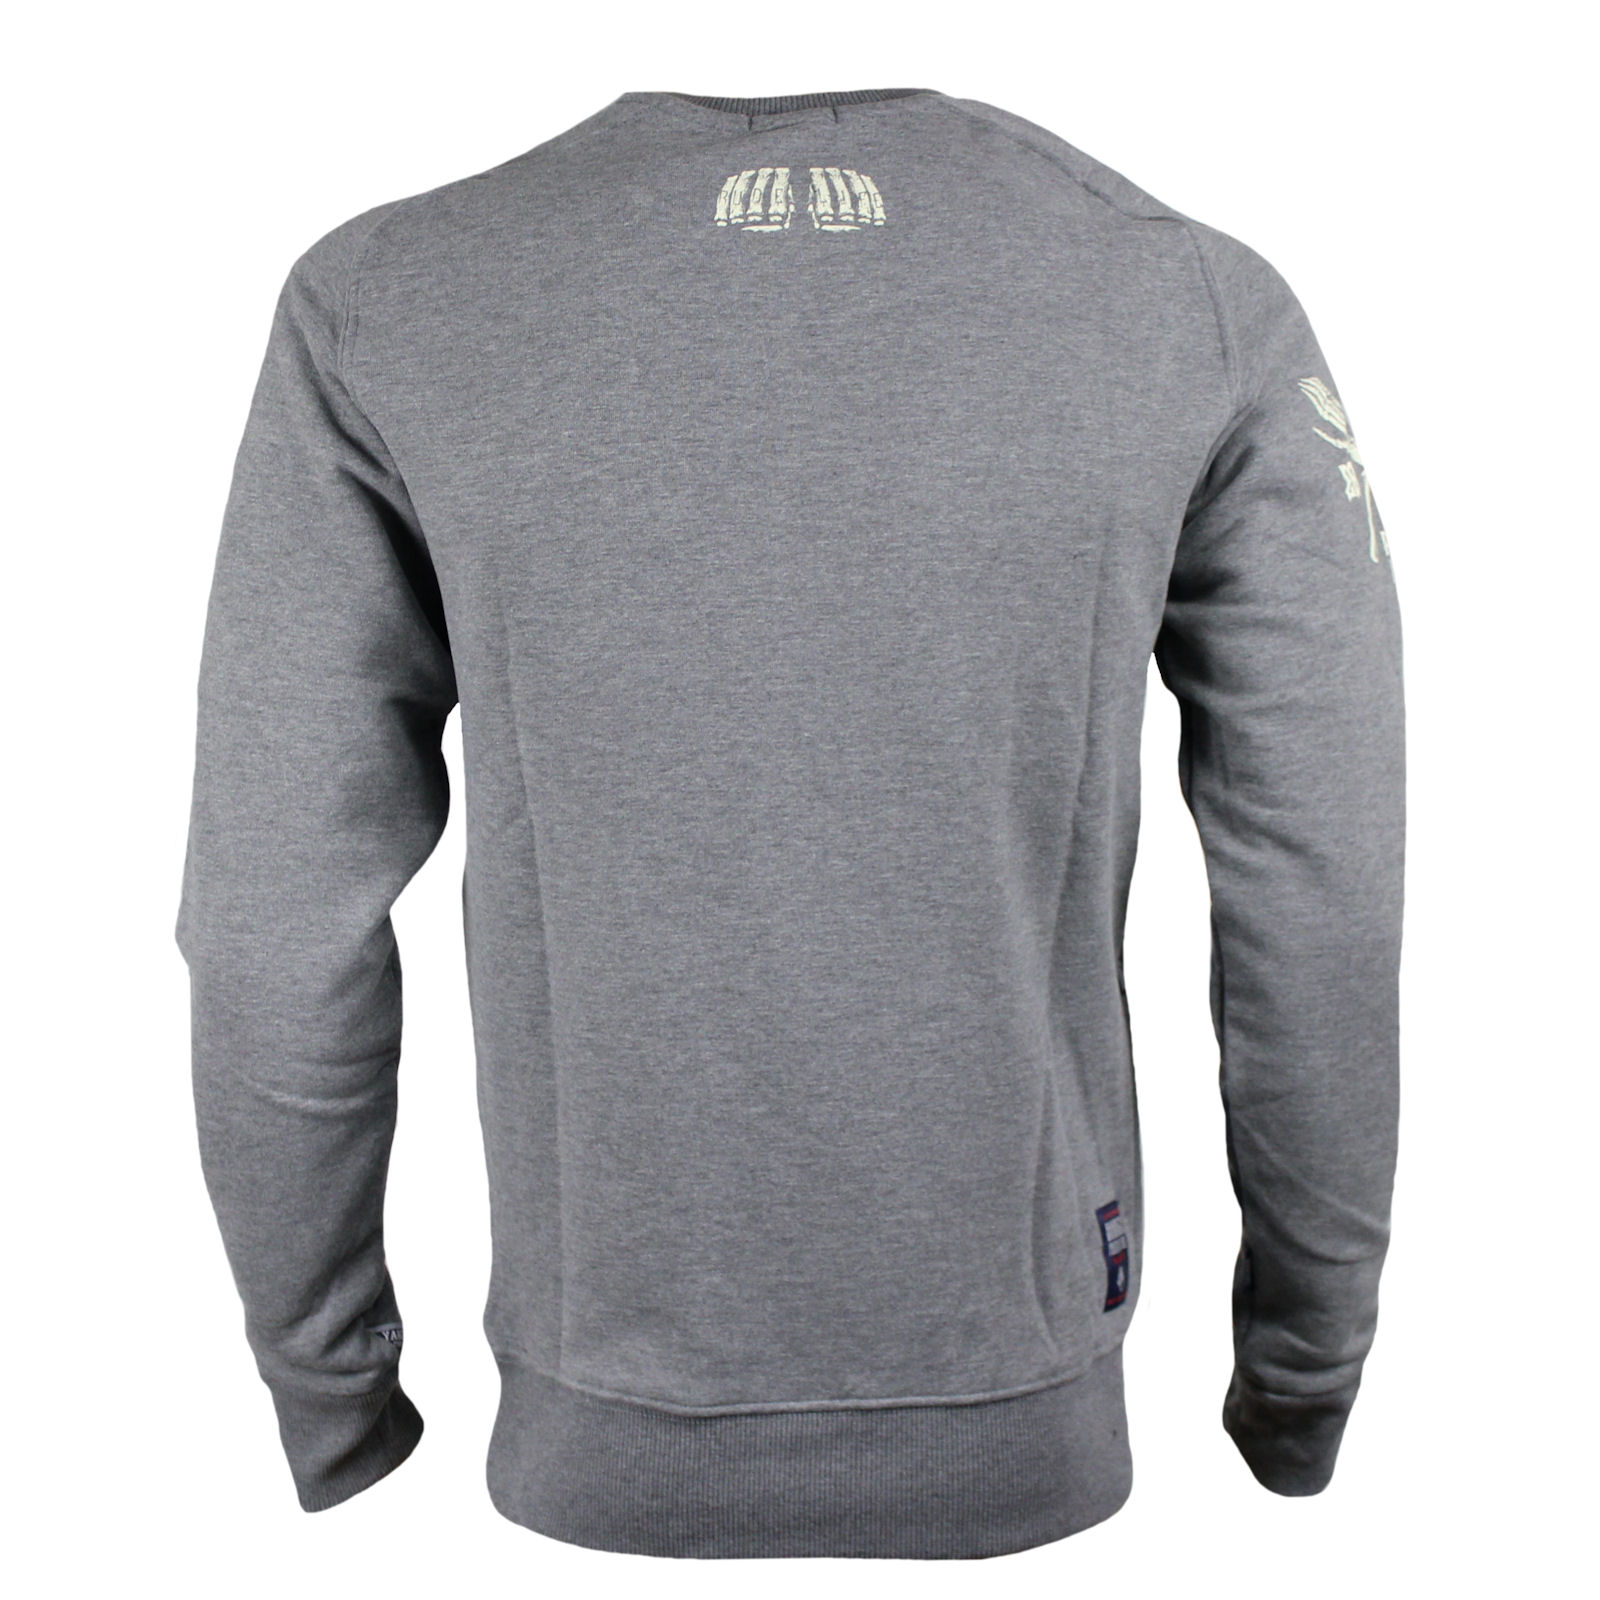 yakuza premium pullover ypp 2327 grau herren sweatshirts. Black Bedroom Furniture Sets. Home Design Ideas